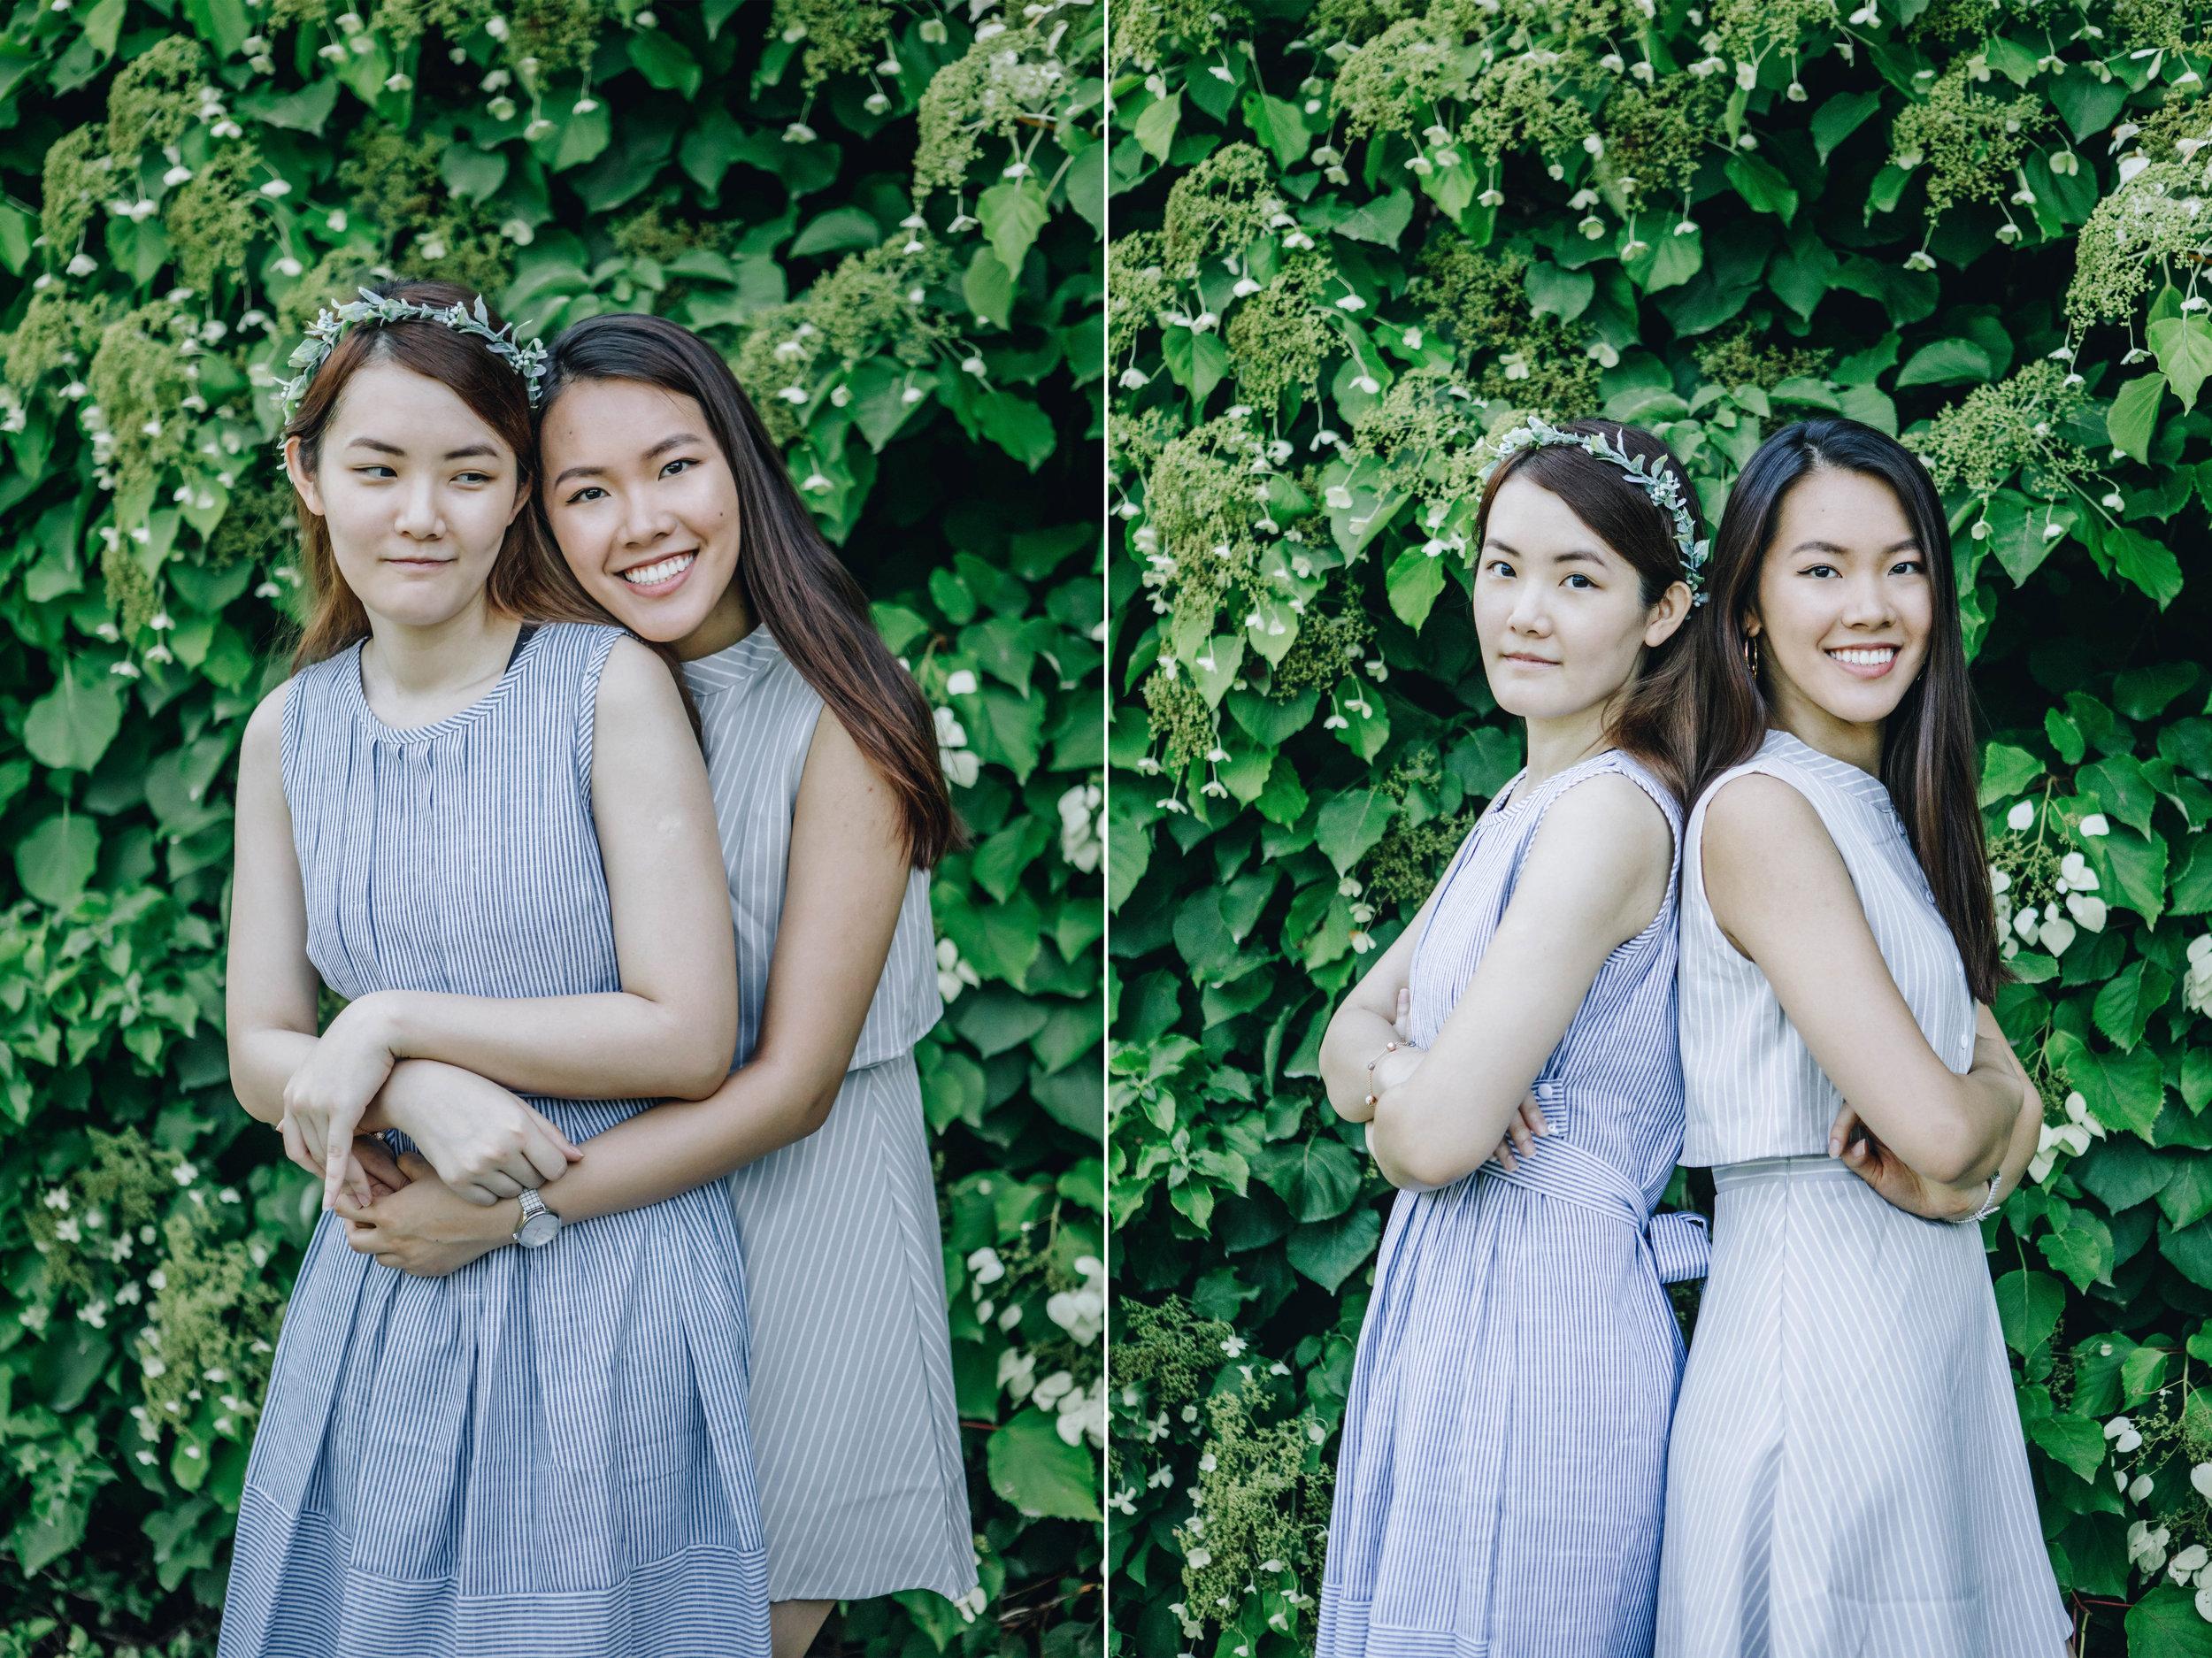 sisters-in-summertime-eva-loh-09.jpg